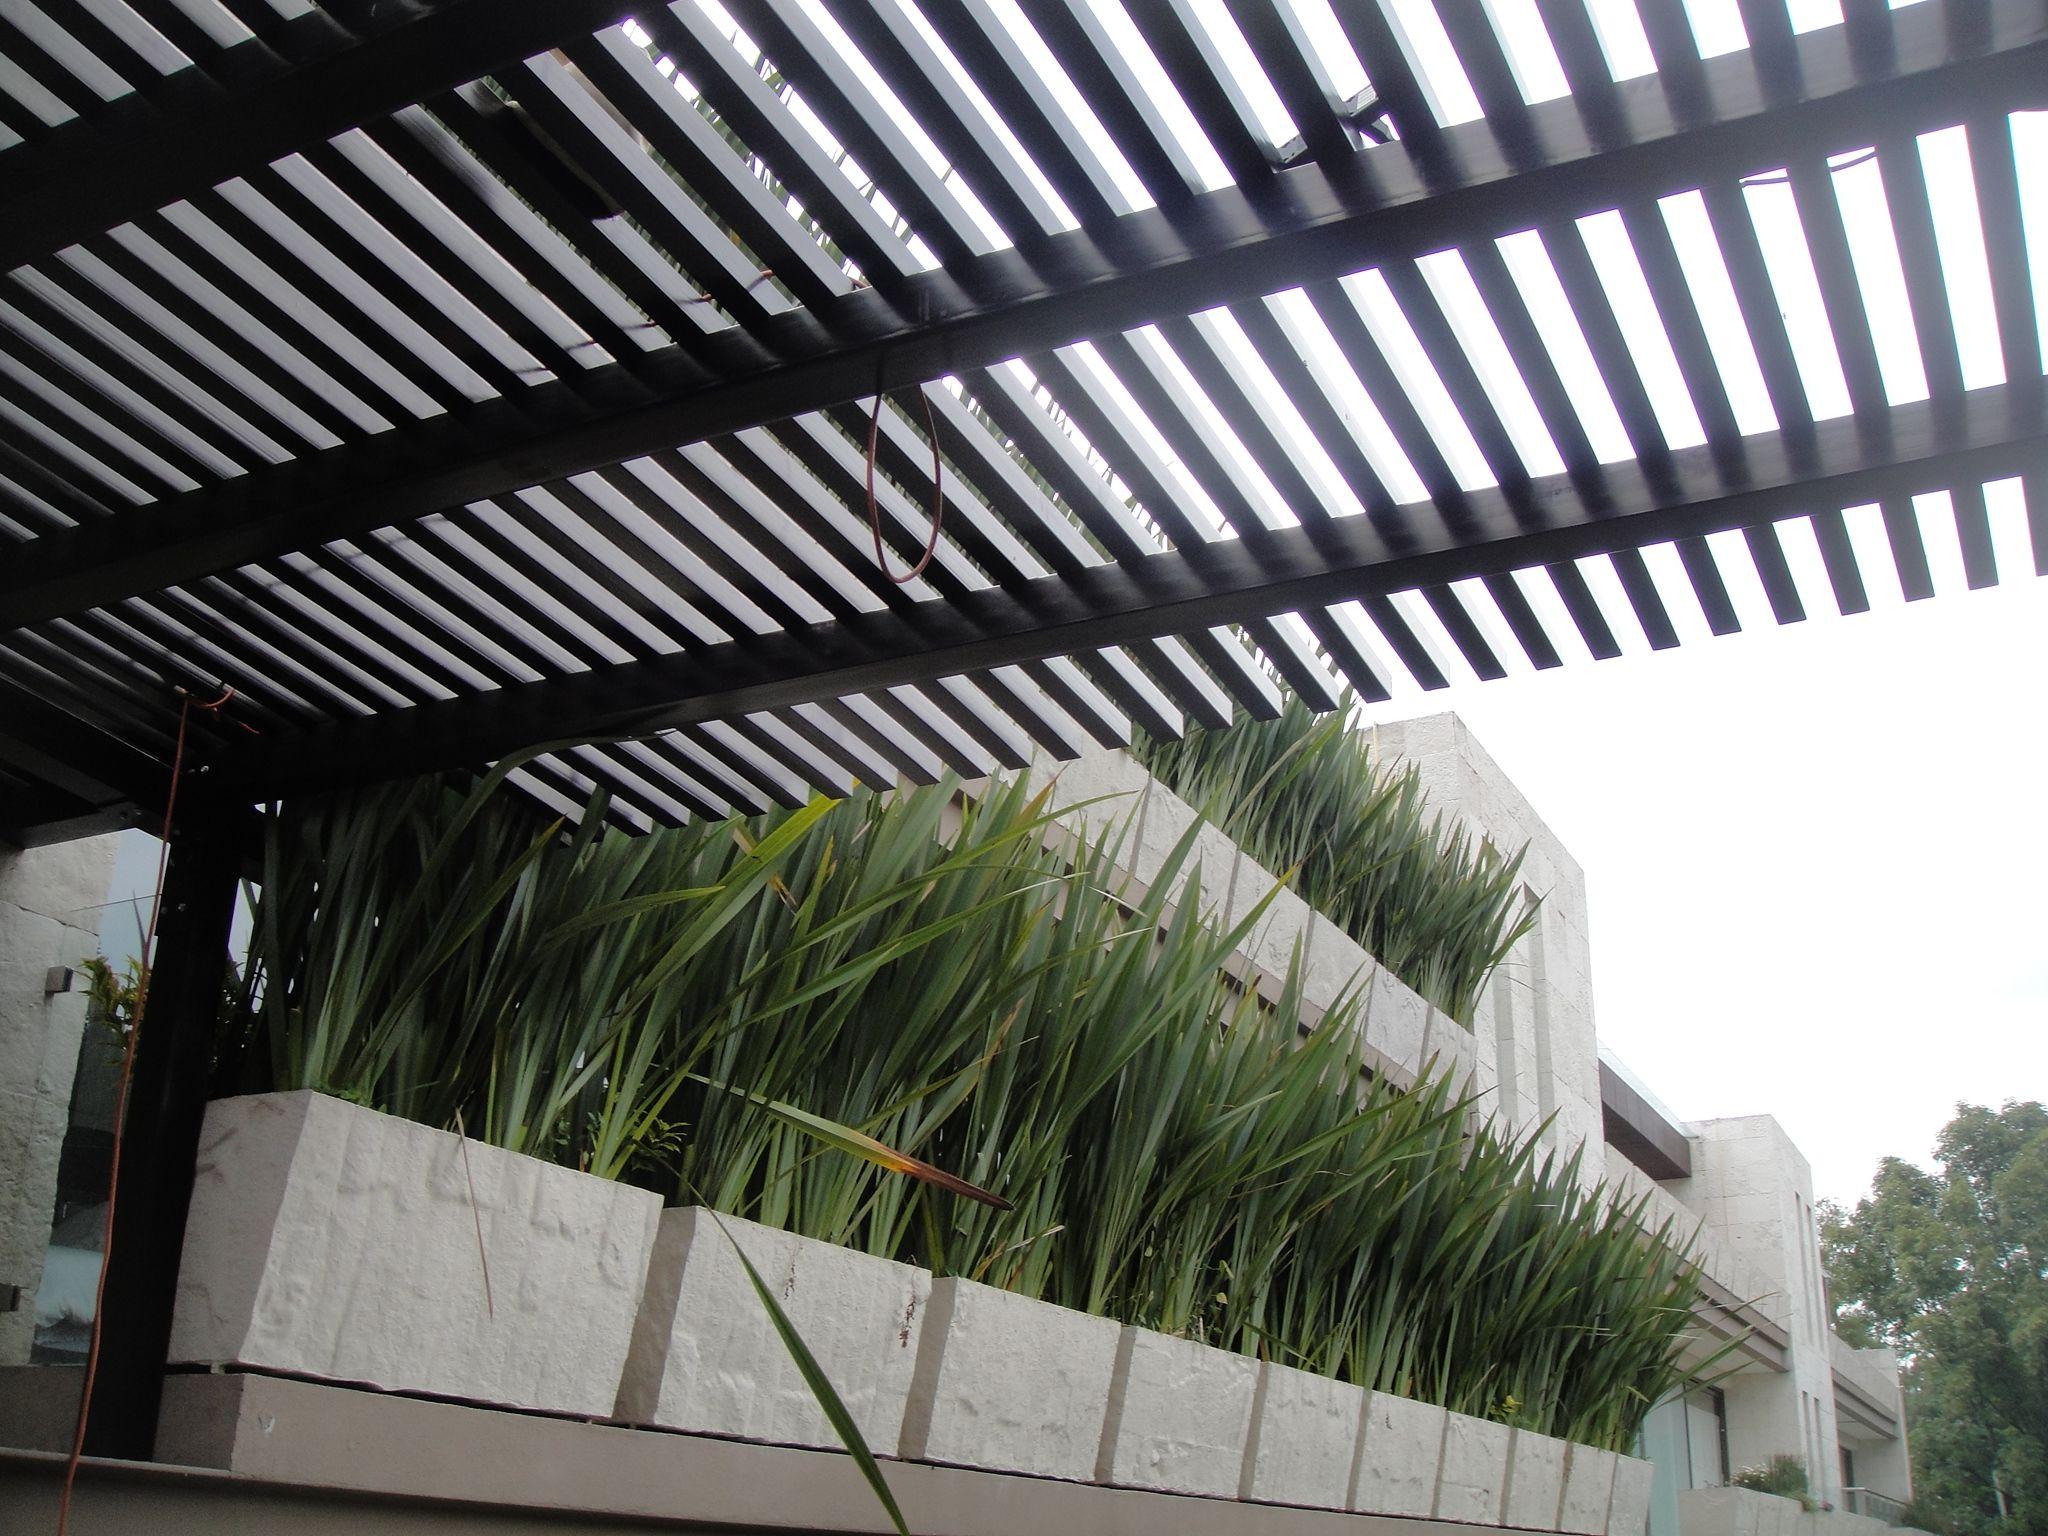 P Rgola Muebles Celos As Deck Terrazaloft Zeromadera  # Muebles Jardin Tokyo